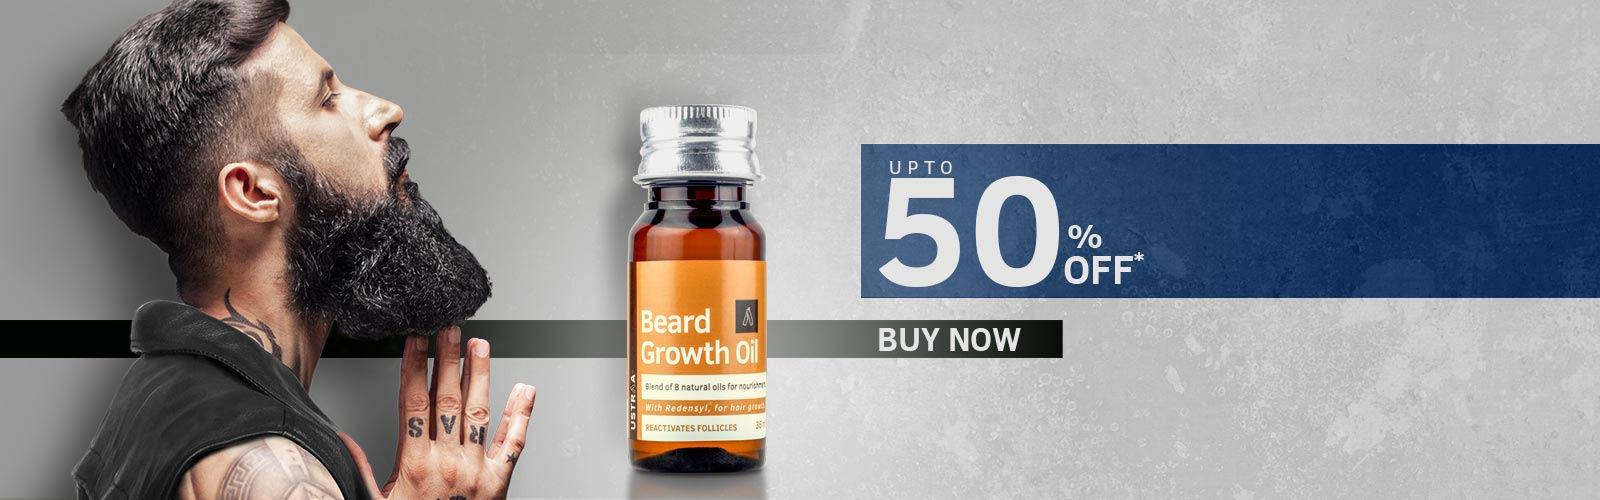 BeardGrowth Oil